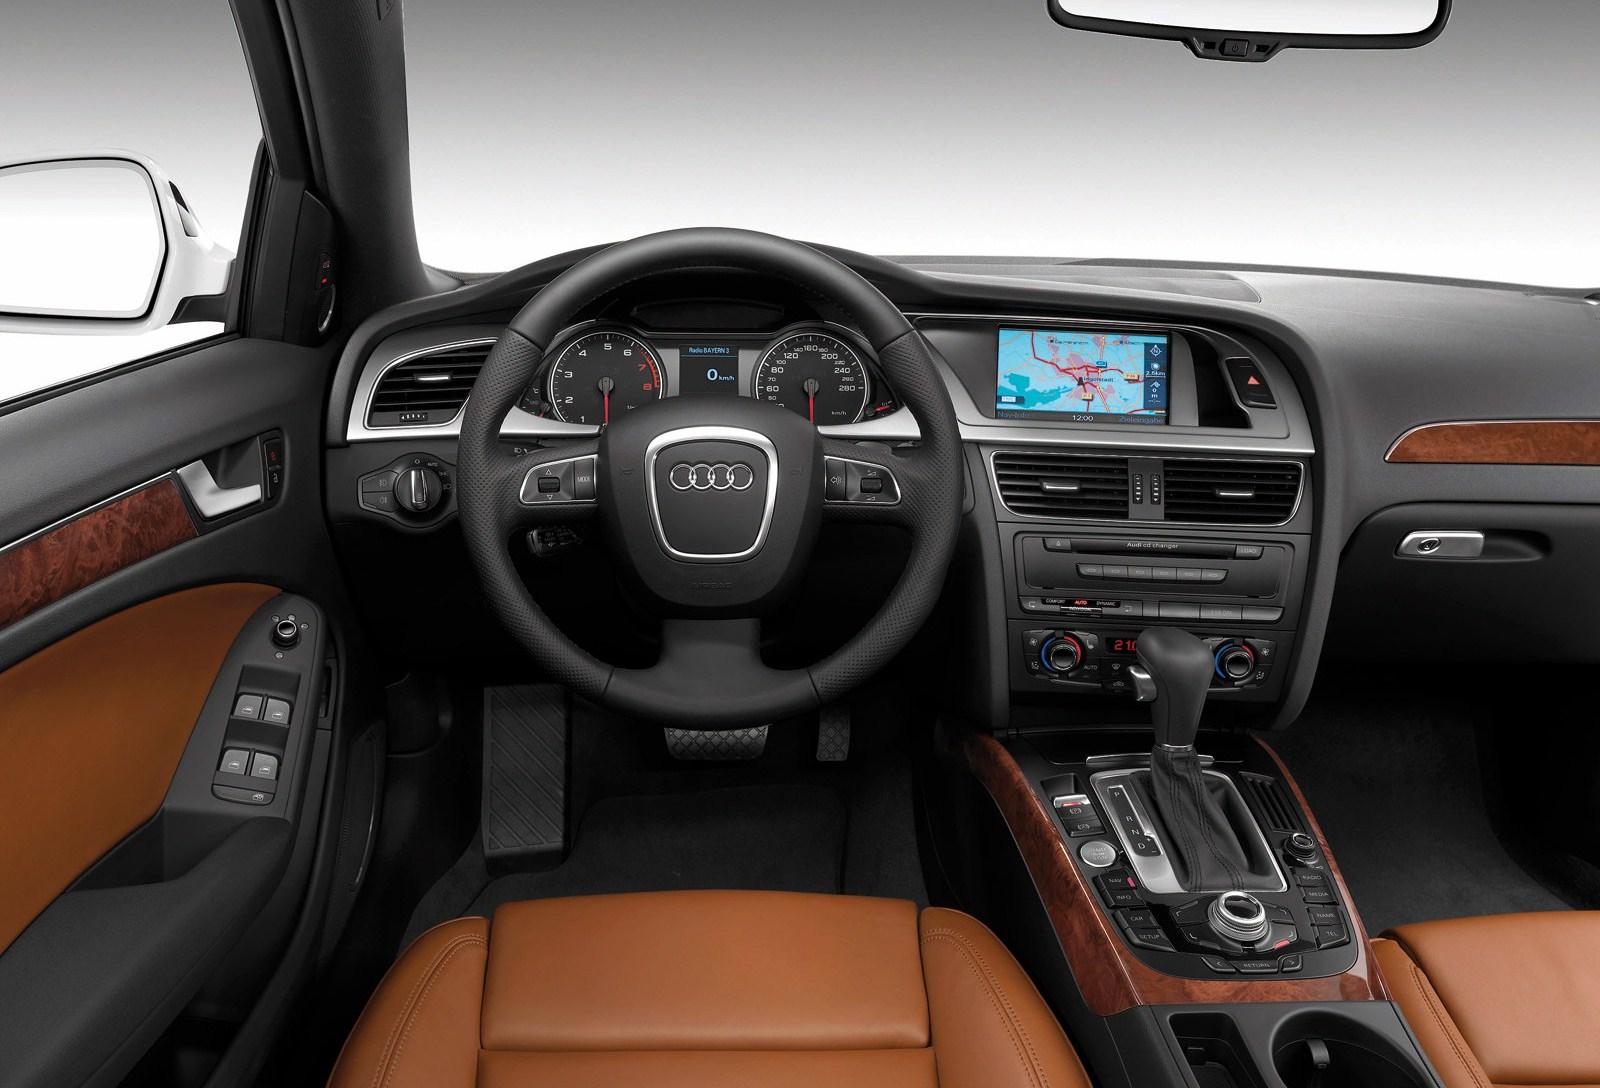 http://4.bp.blogspot.com/_sRGU_JXOz6E/TSiTfM6D1VI/AAAAAAAABFQ/Fq85Rto7GDc/s1600/Audi-A4_2008_wallpaper+interior_45.jpg